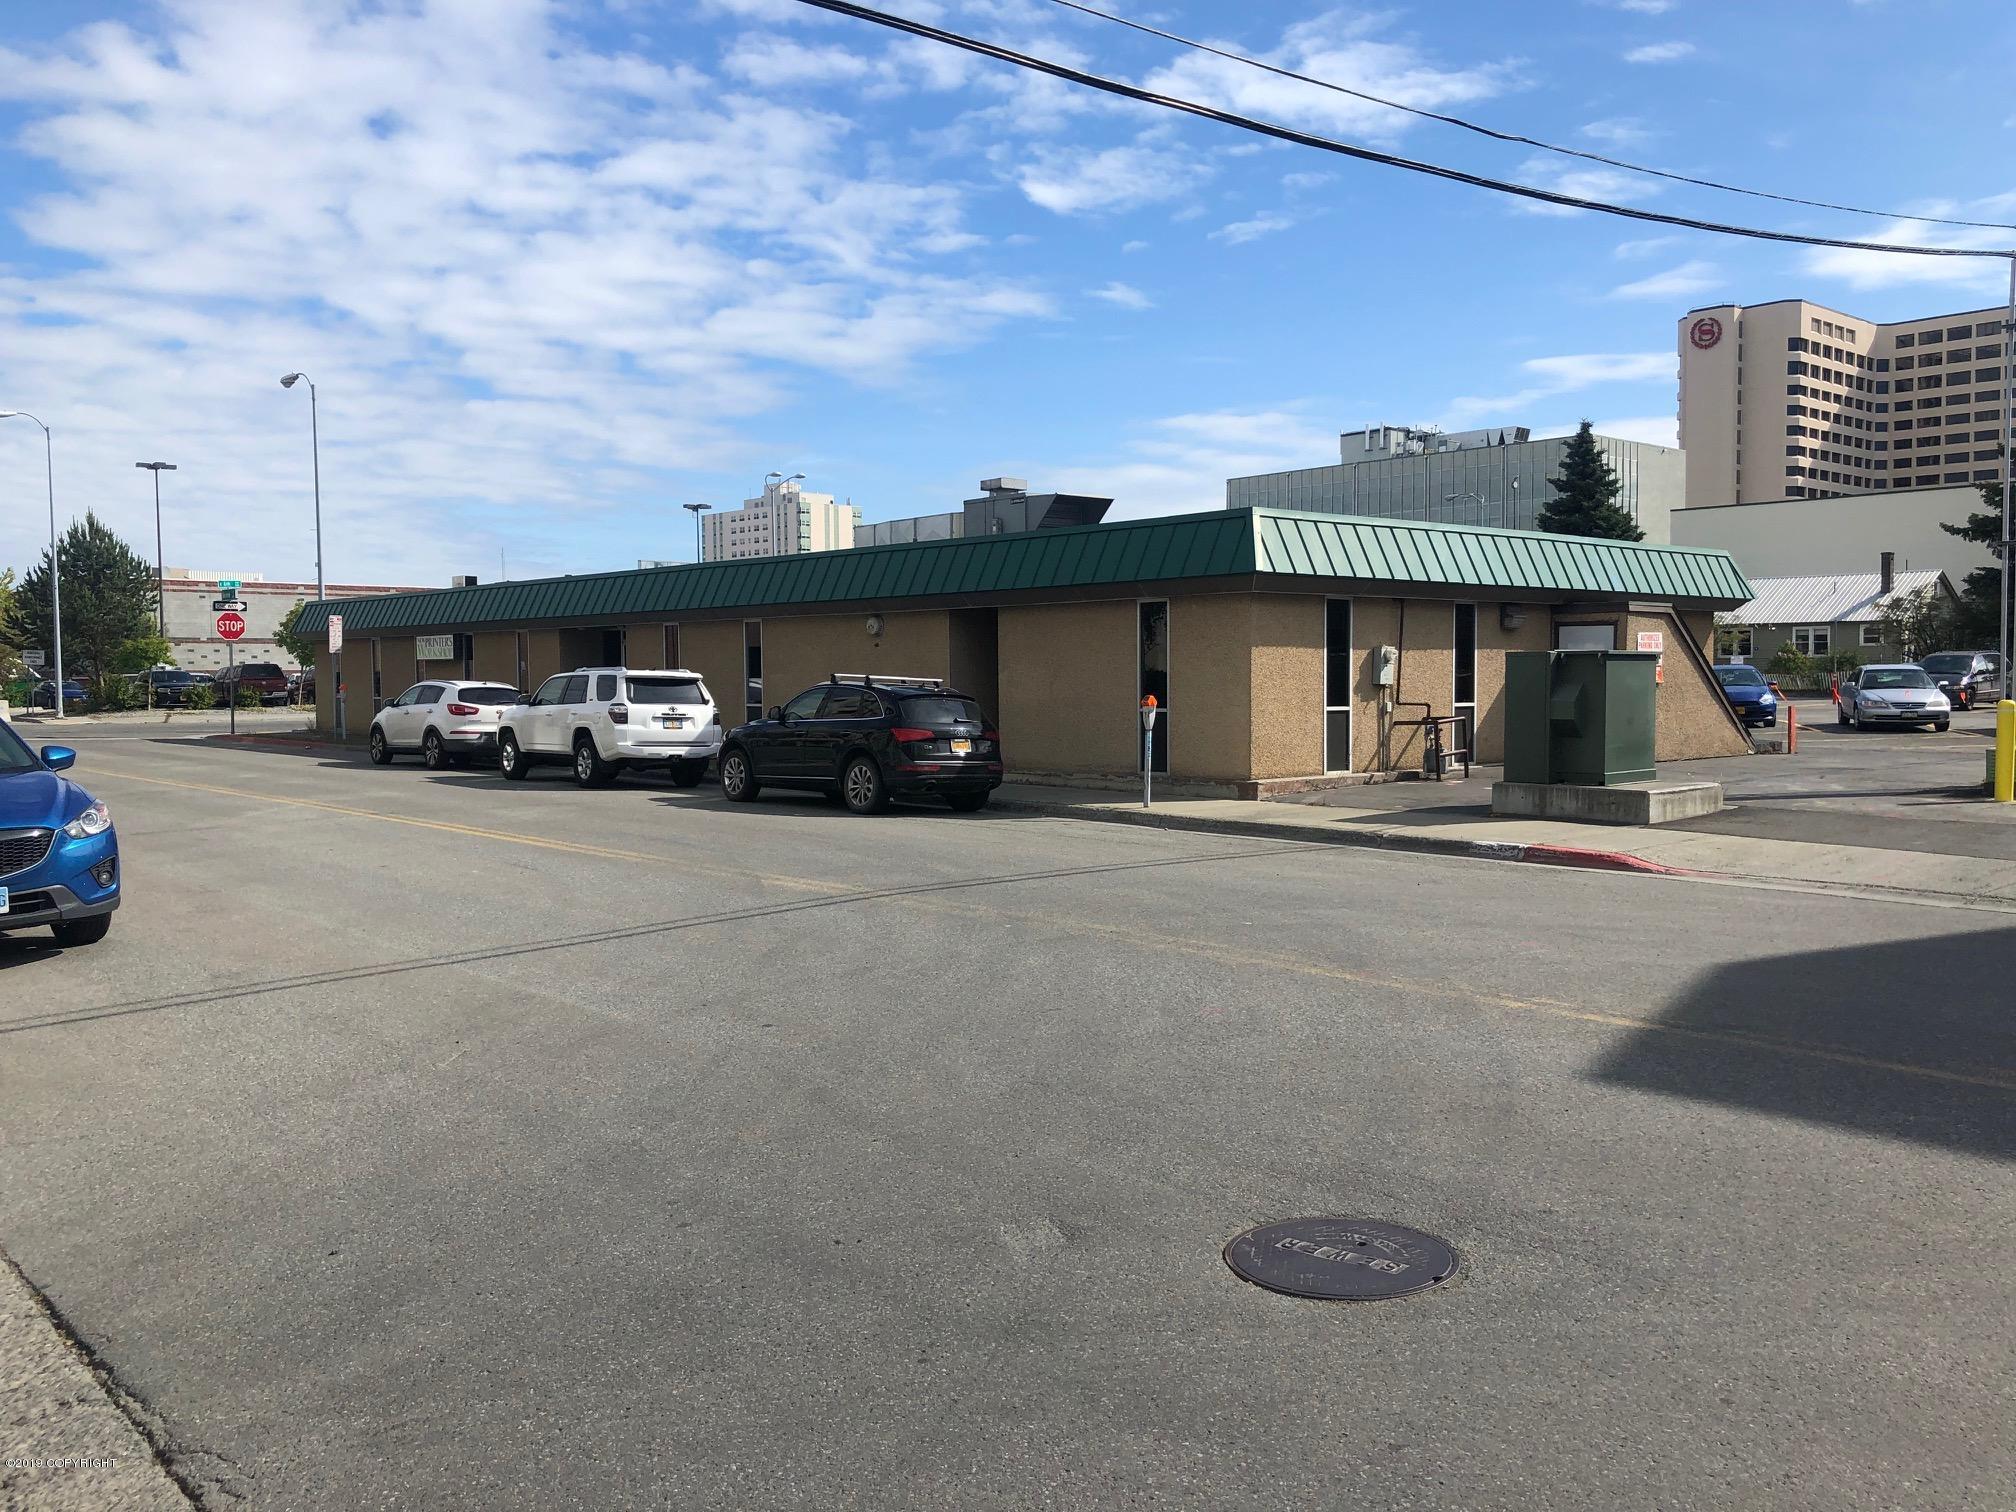 605 Barrow Street, Anchorage, AK 99501